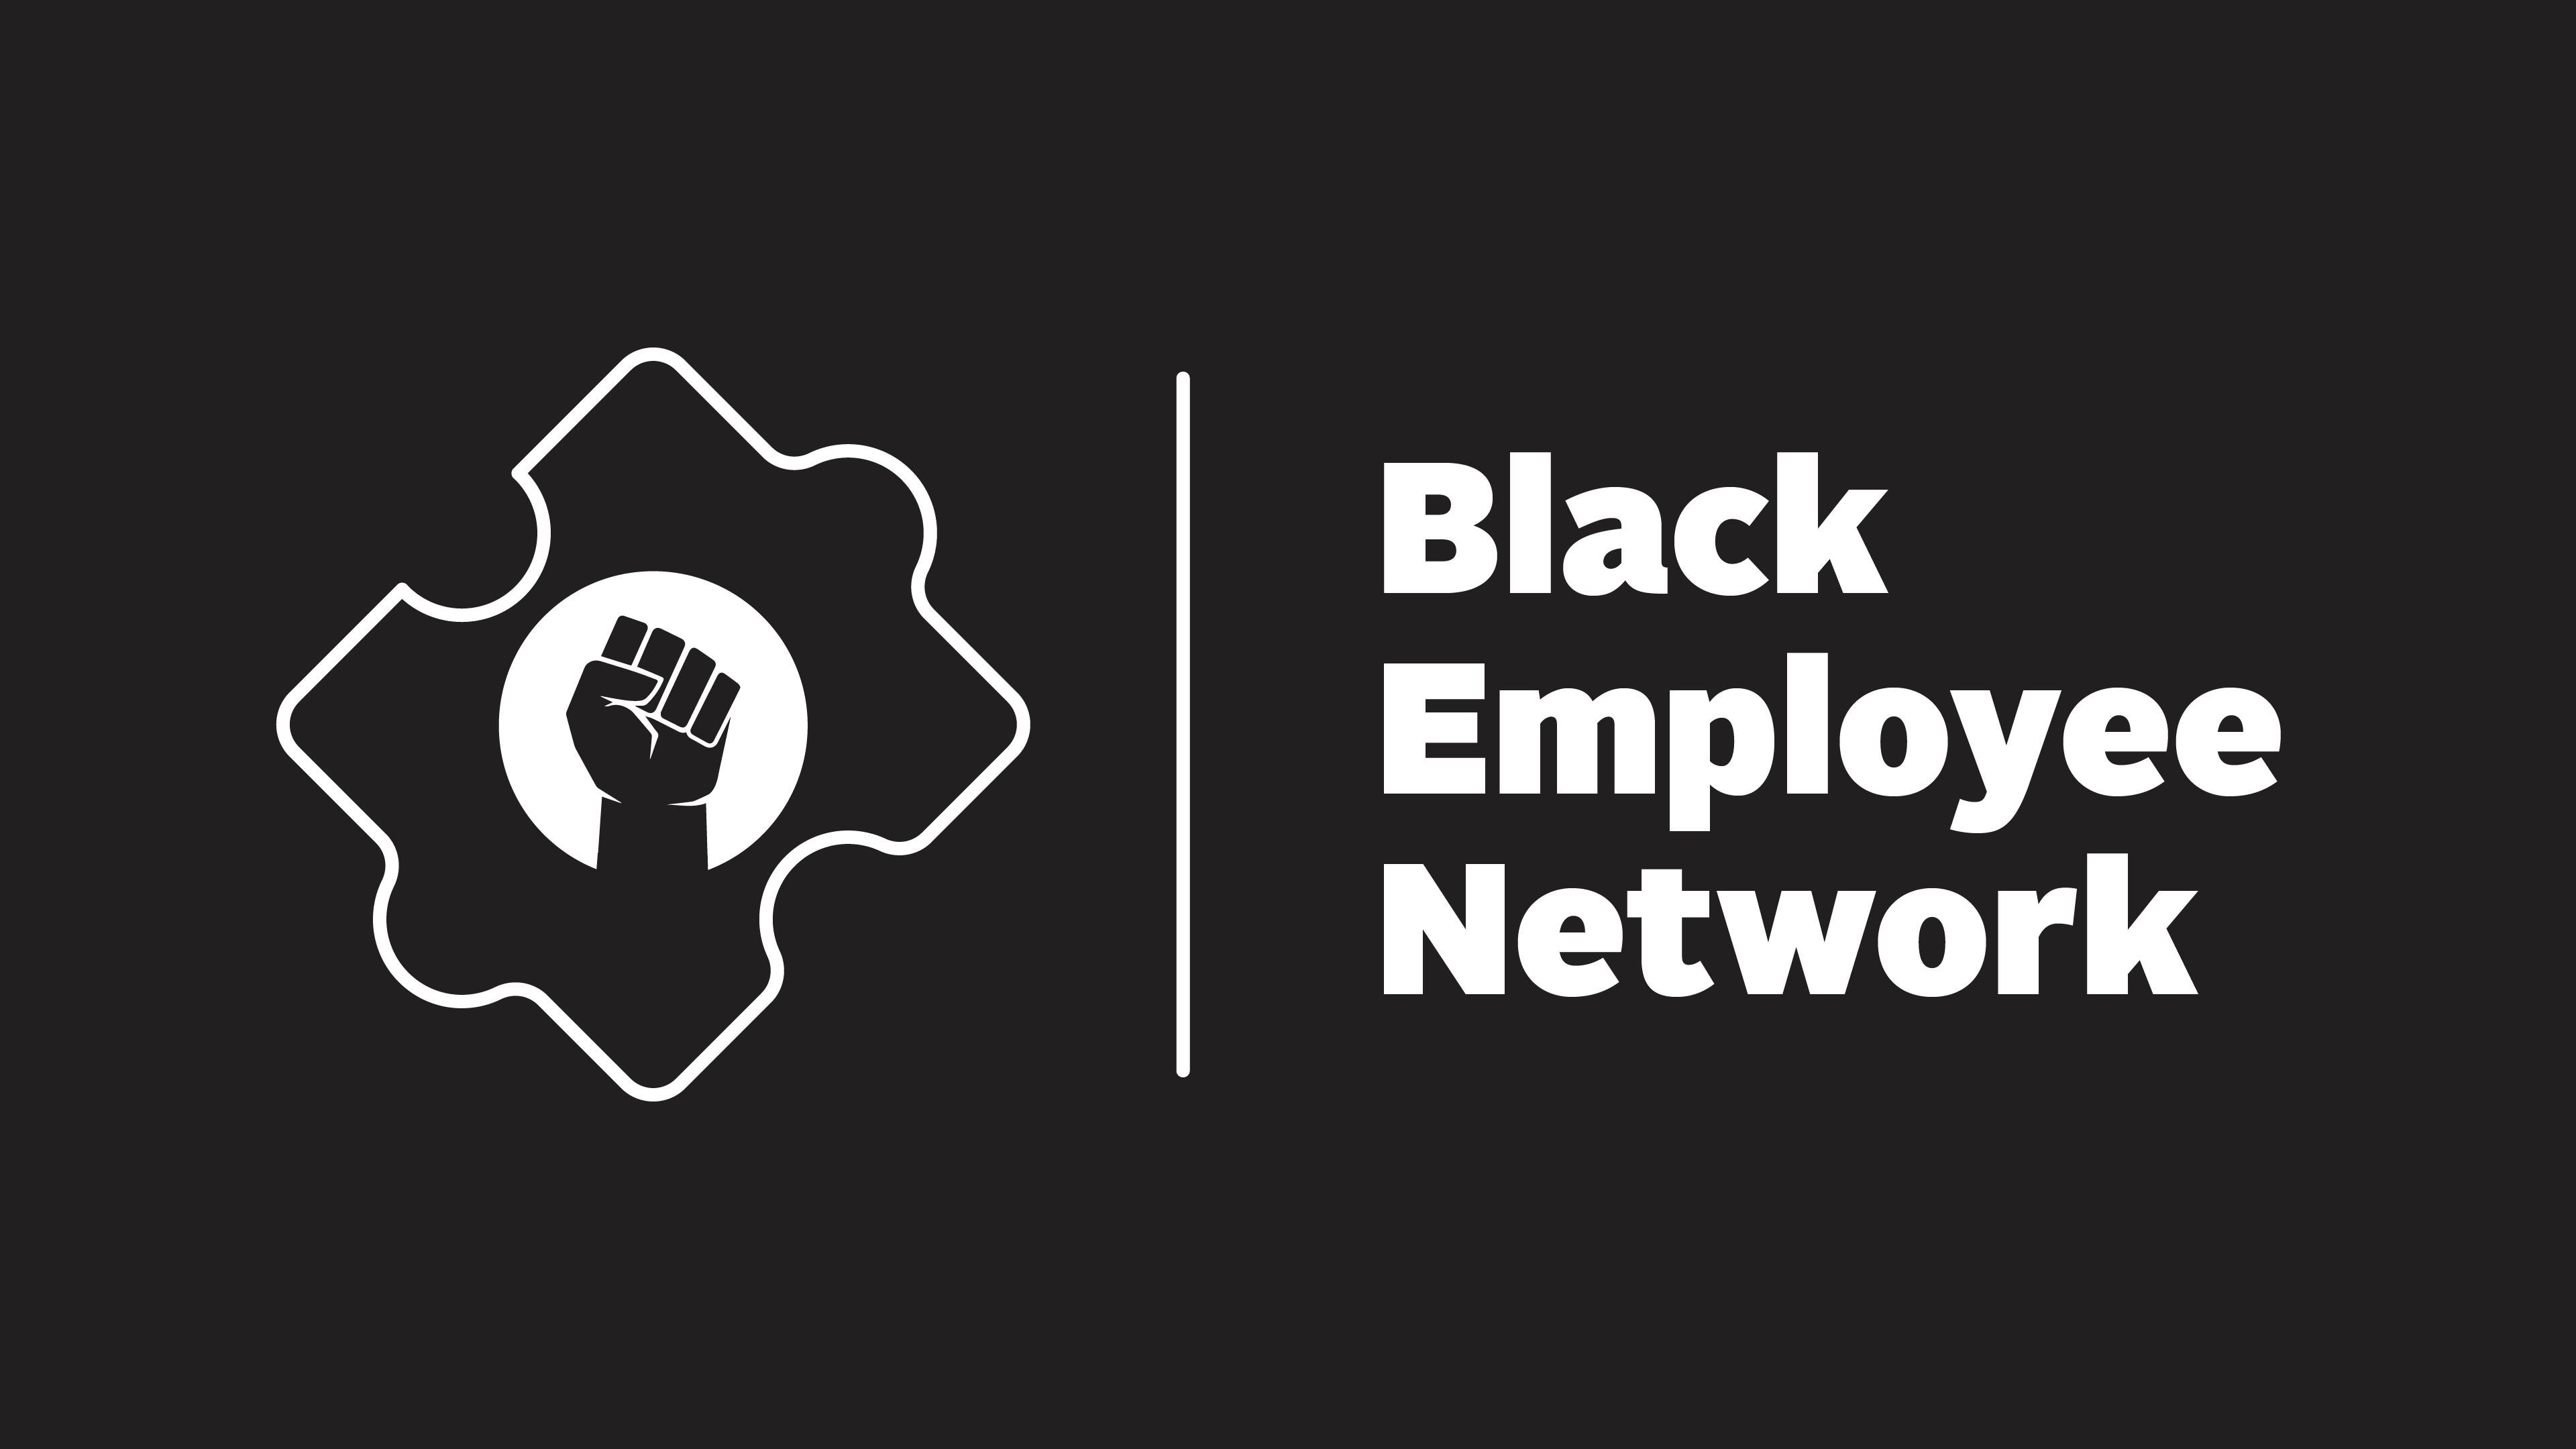 Black Employee Network logo